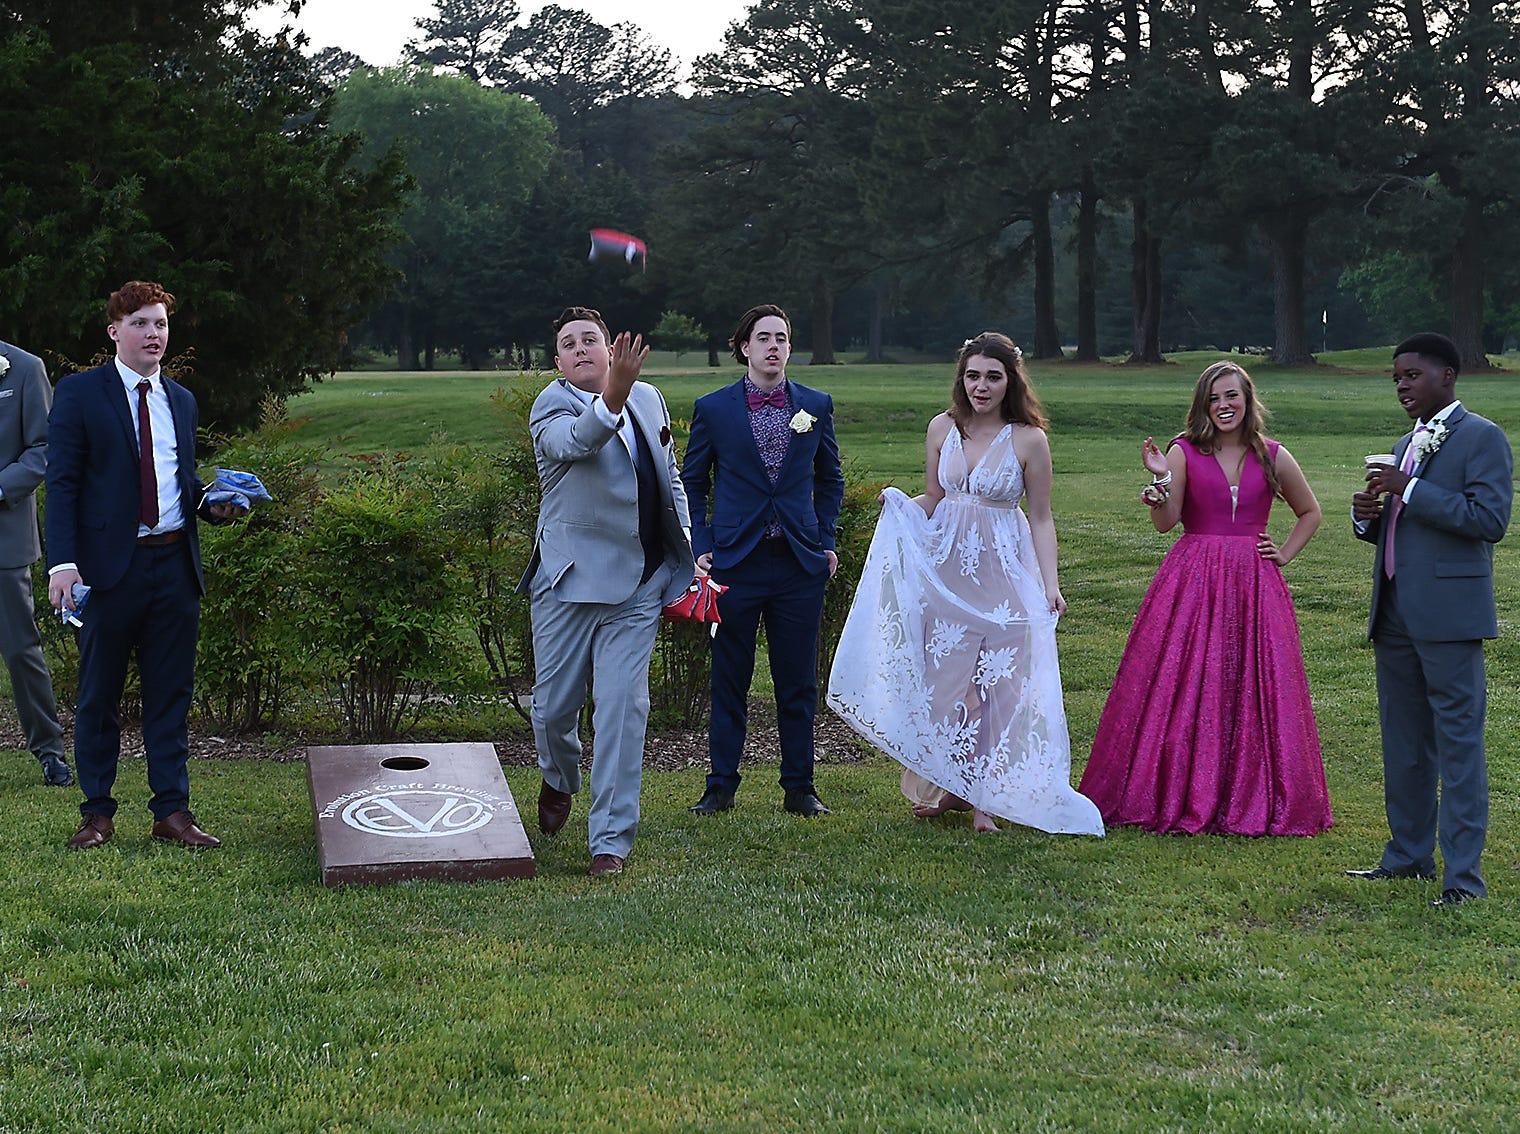 Salisbury Christian School students attend prom on Saturday, May 4, 2019.